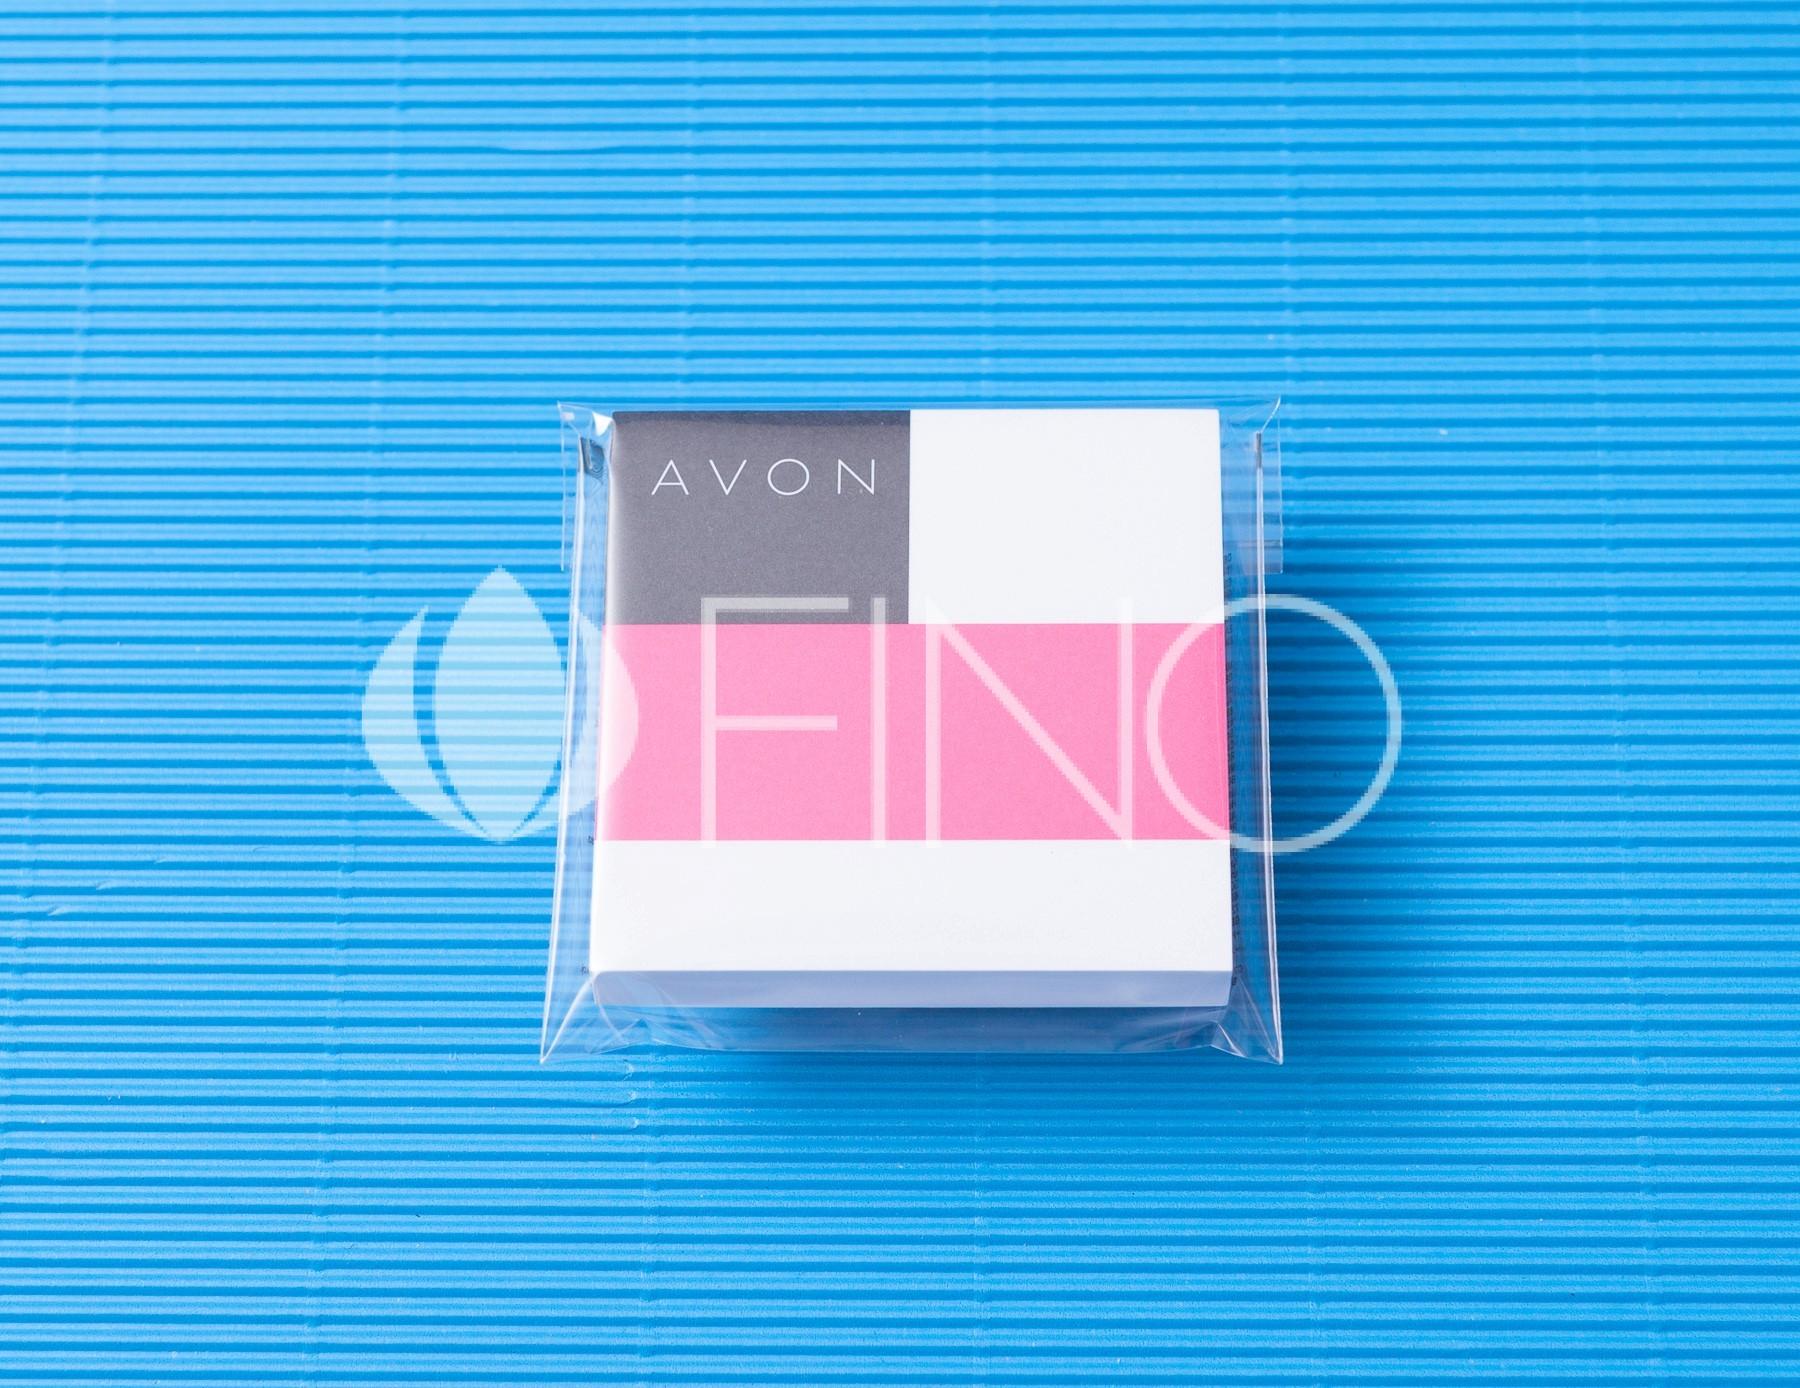 Production of plastic bags | FINO